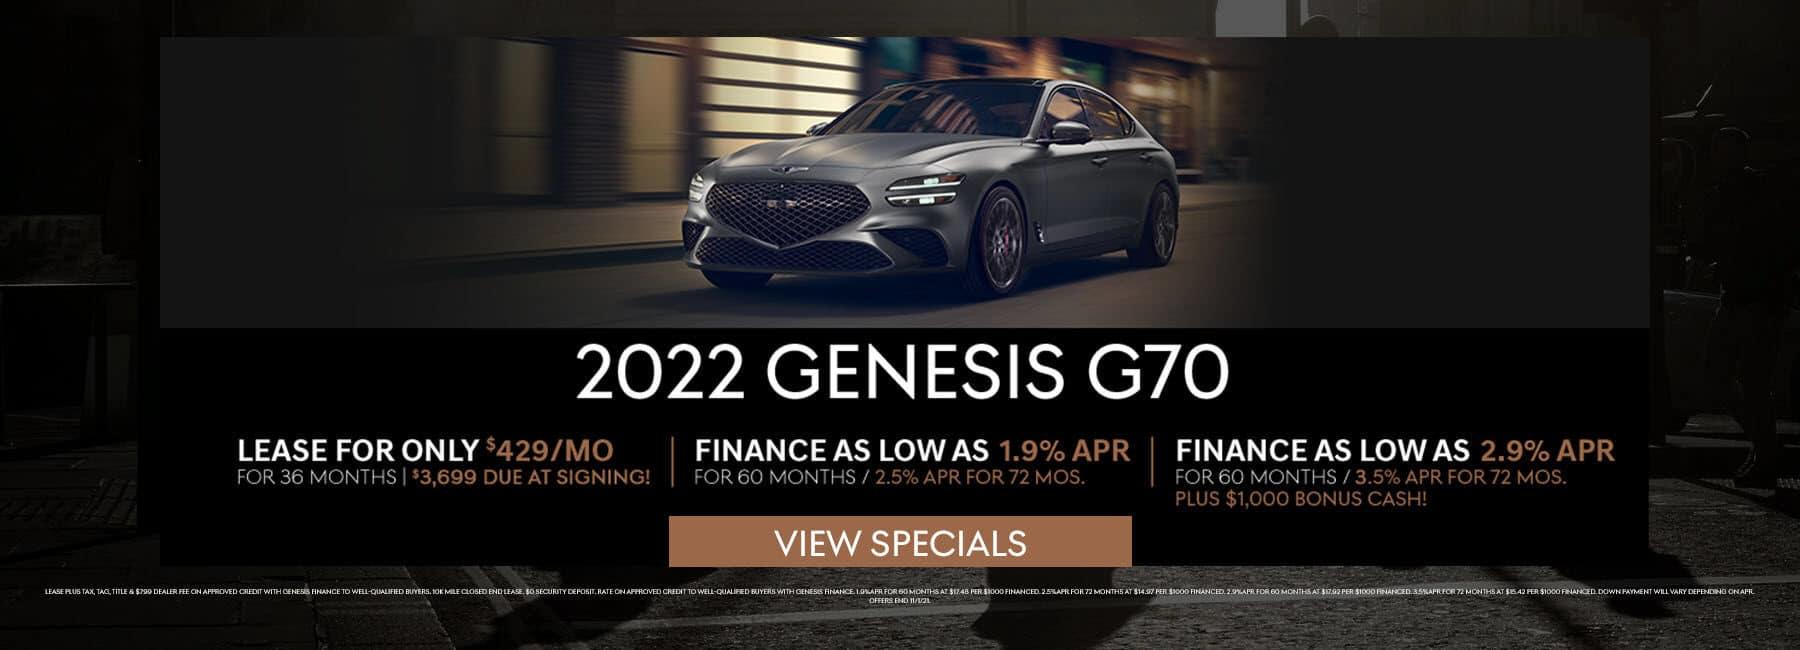 2022 g70-sept21 Updated